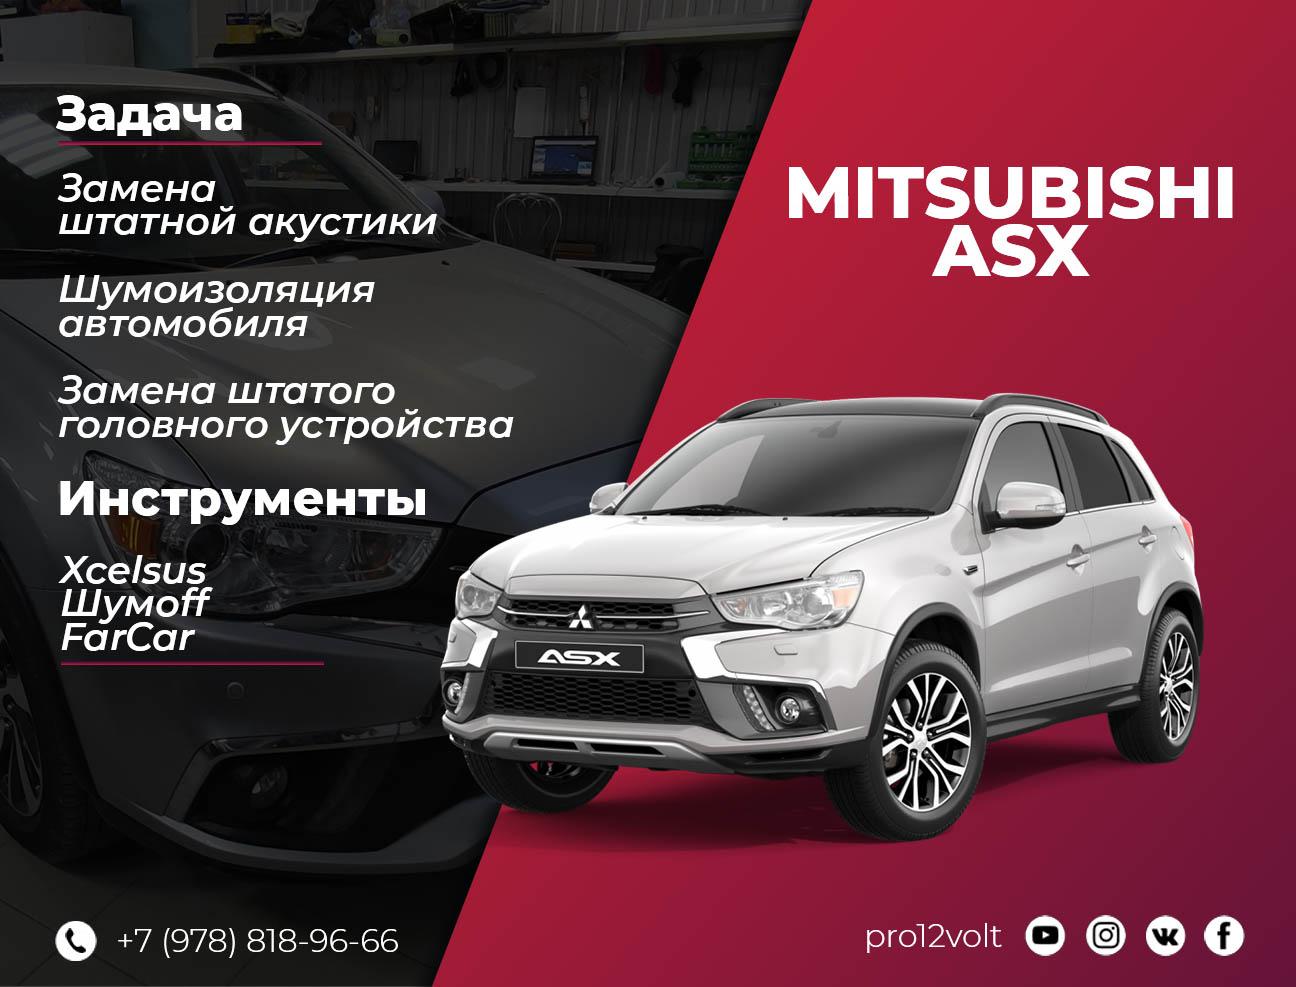 Mitsubishi ASX (замена штатной акустики, шумоизоляция, замена головного устройства)